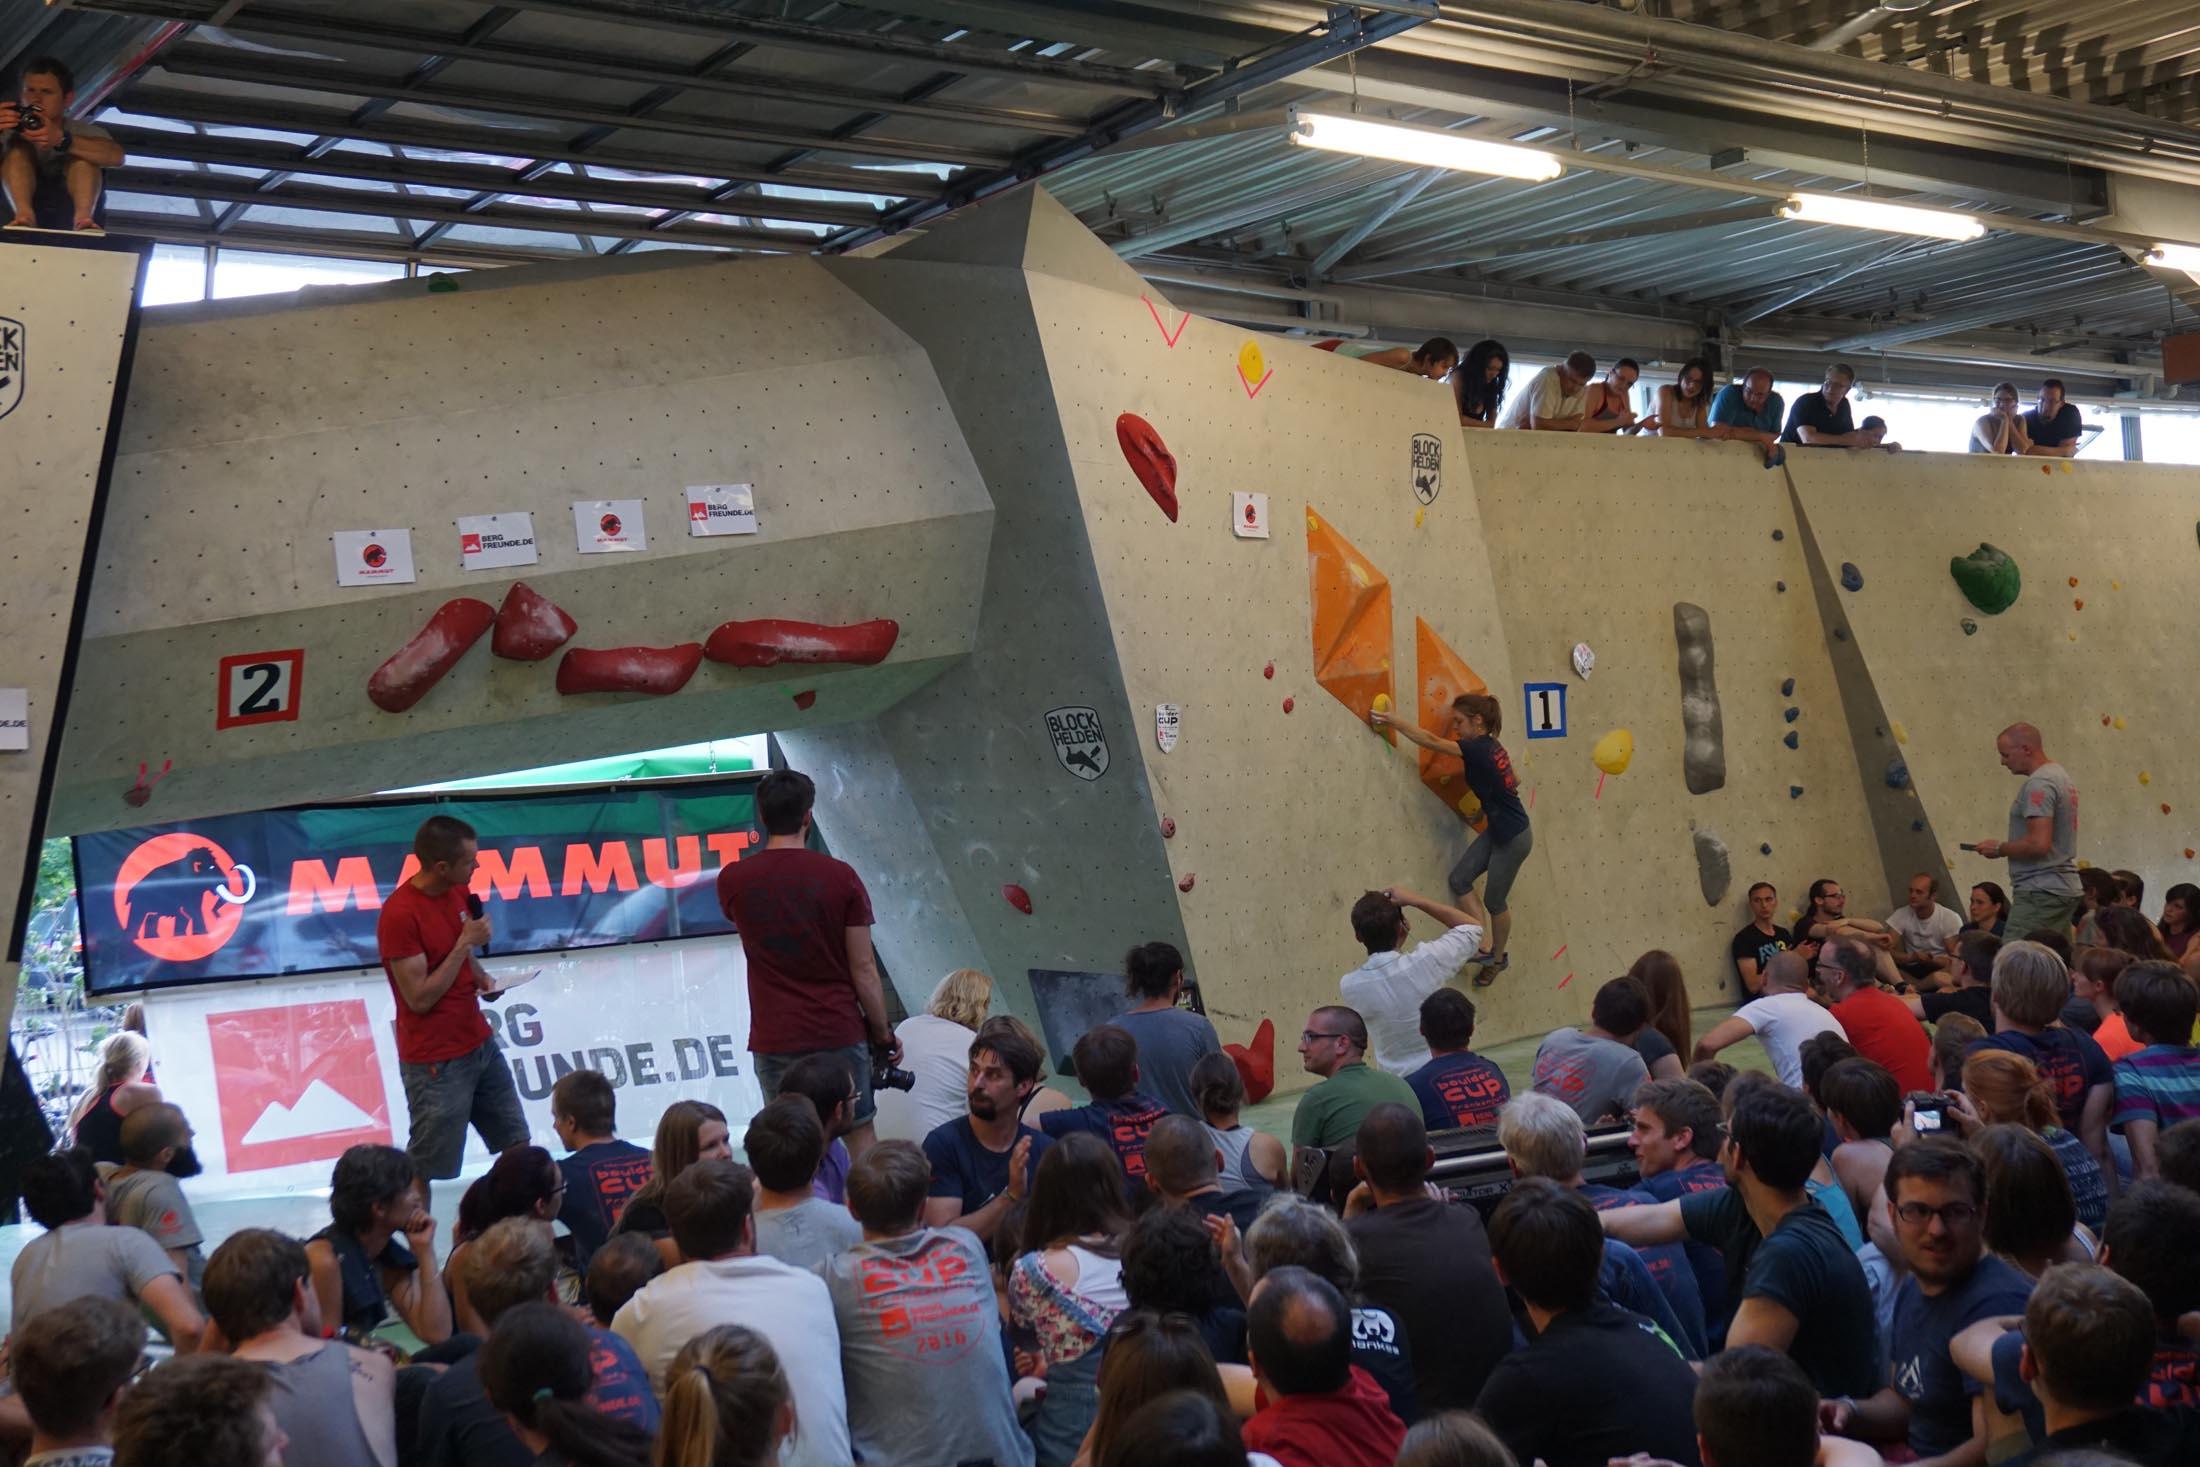 Finale, internationaler bouldercup Frankenjura 2016, BLOCKHELDEN Erlangen, Mammut, Bergfreunde.de, Boulderwettkampf07092016577